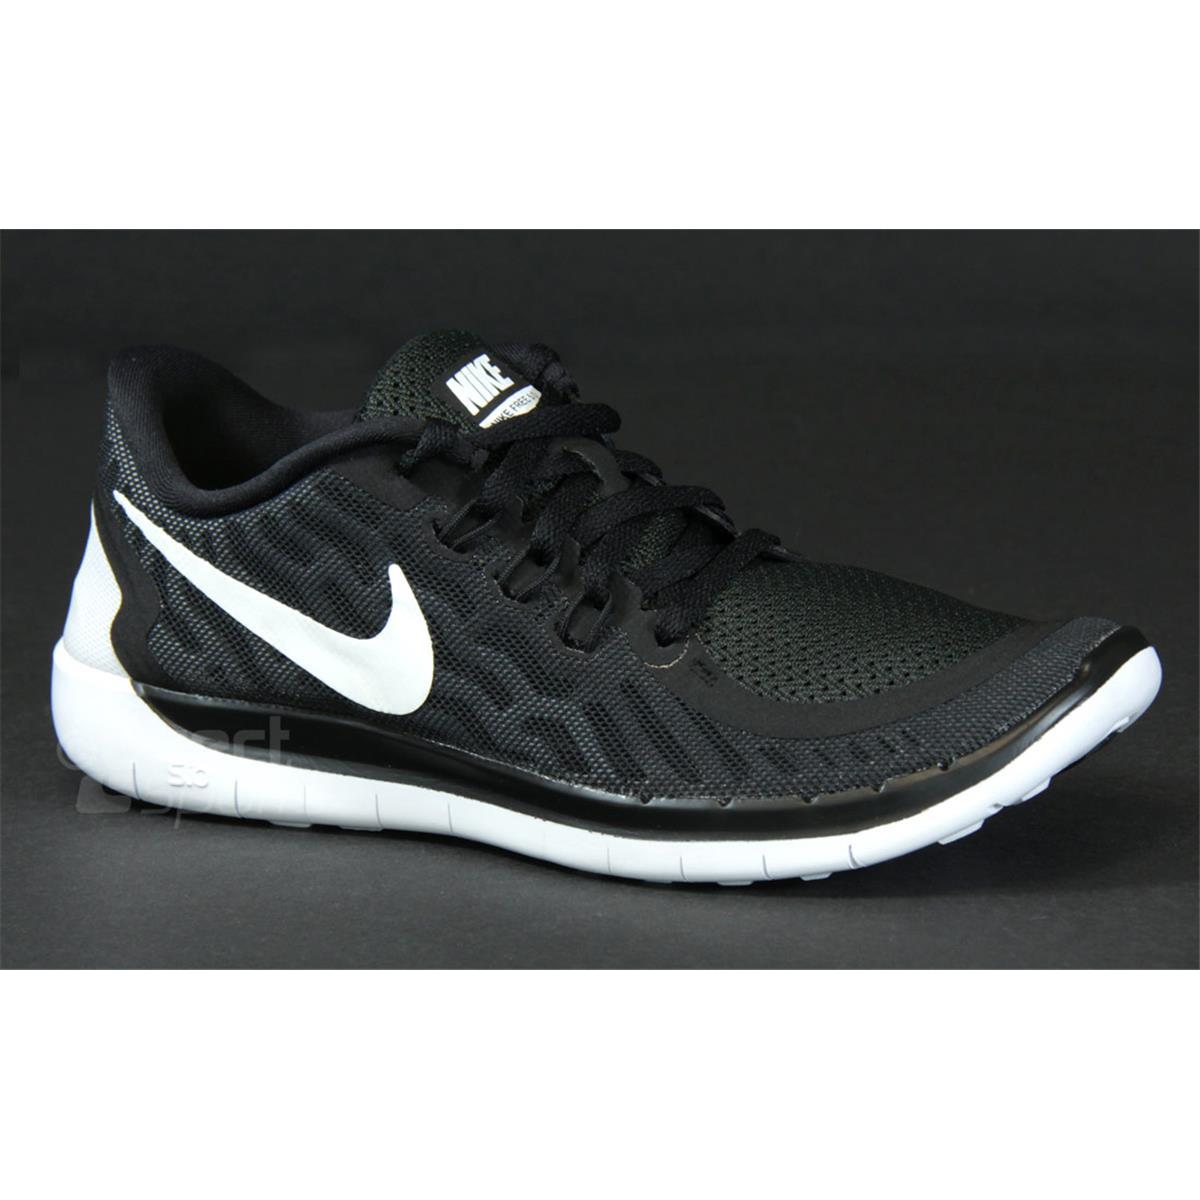 Nike Free 5.0 Junior Sports Trainers